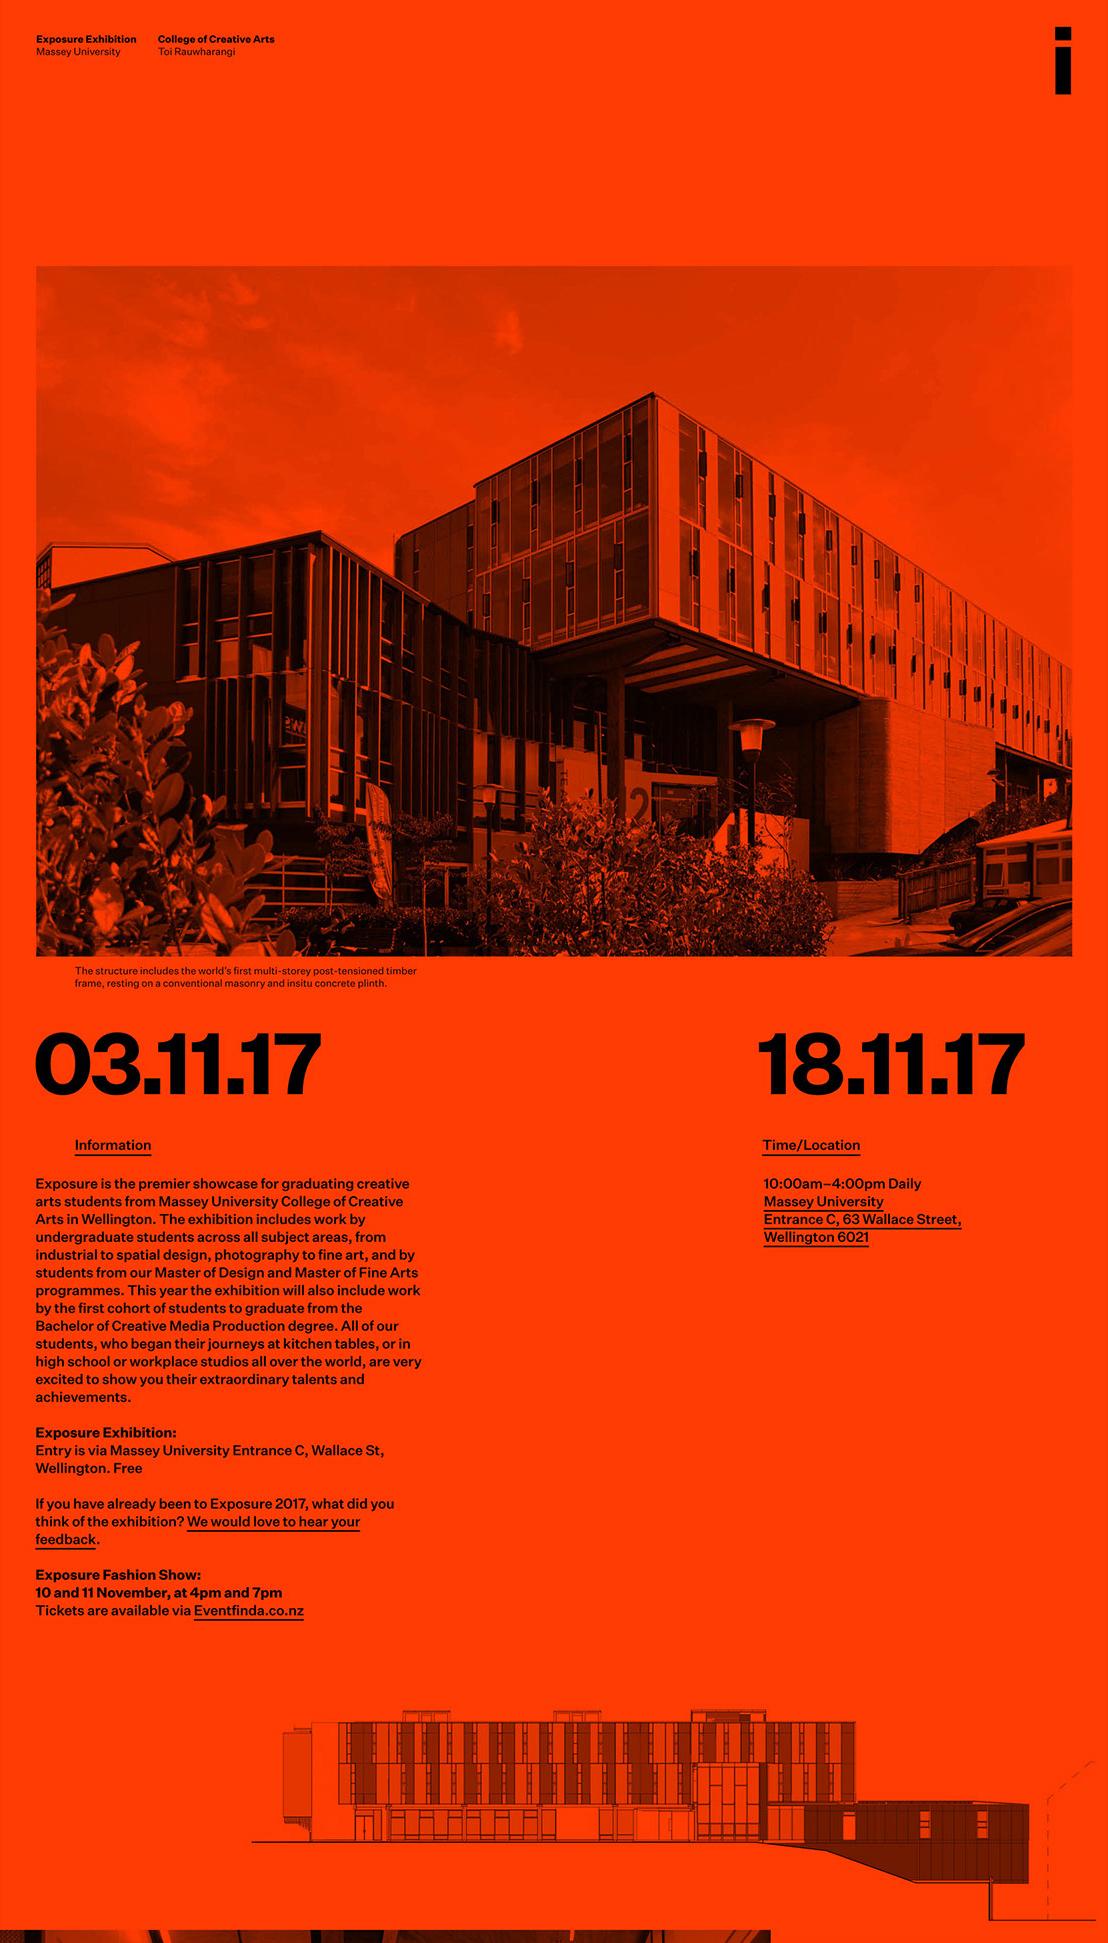 Luke Hoban Jeremy Hooper Raphael Roake  —Massey University Exposure Exhibition